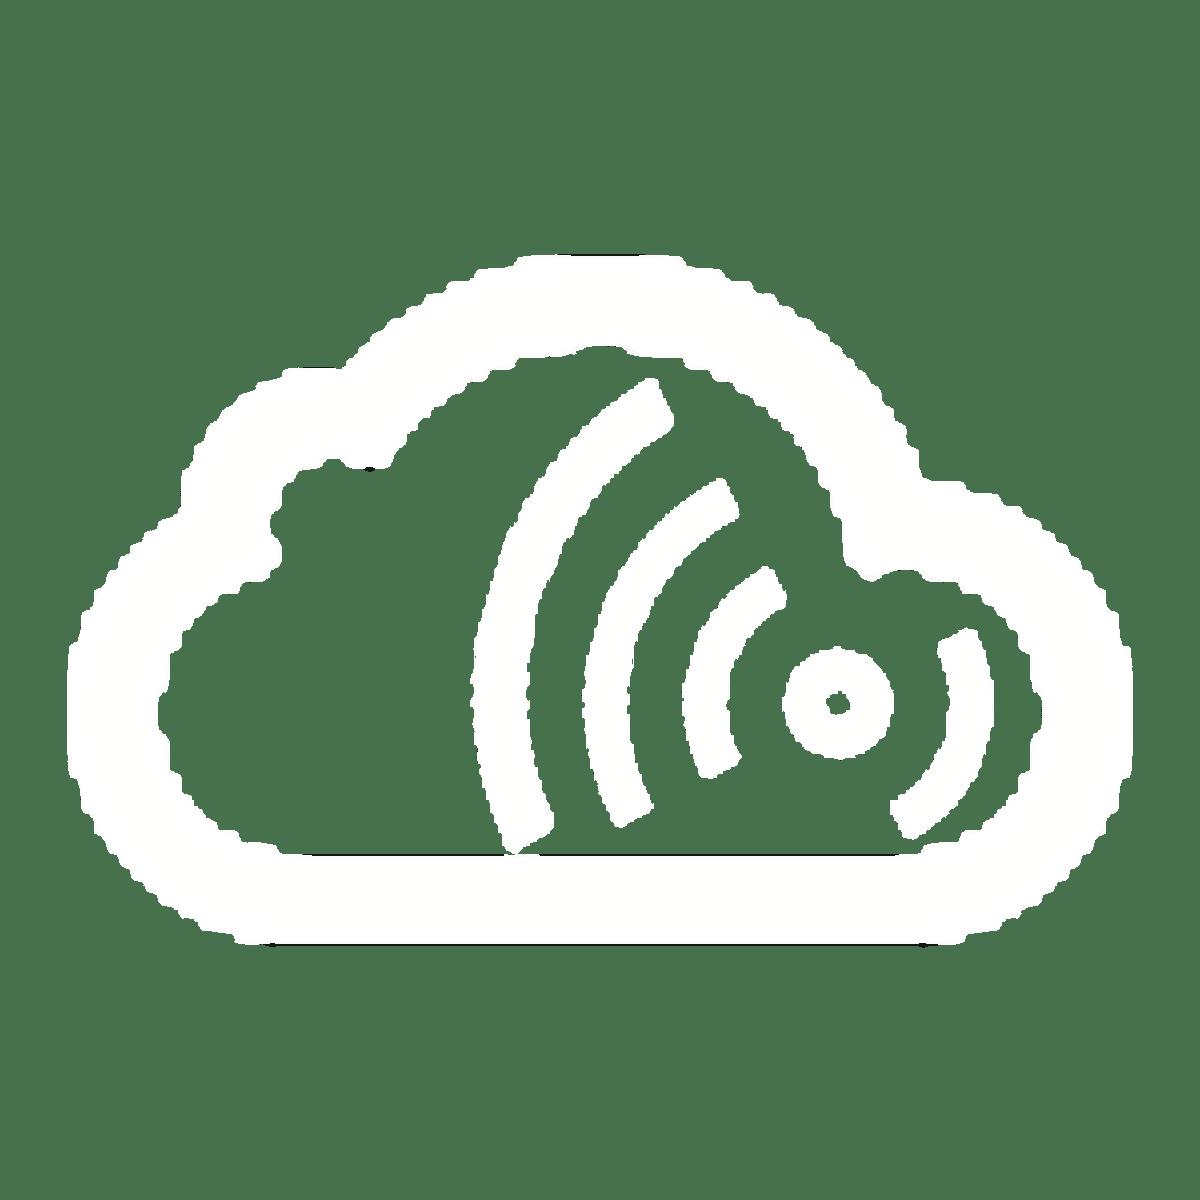 Skyradar - Find a flight Varies with device